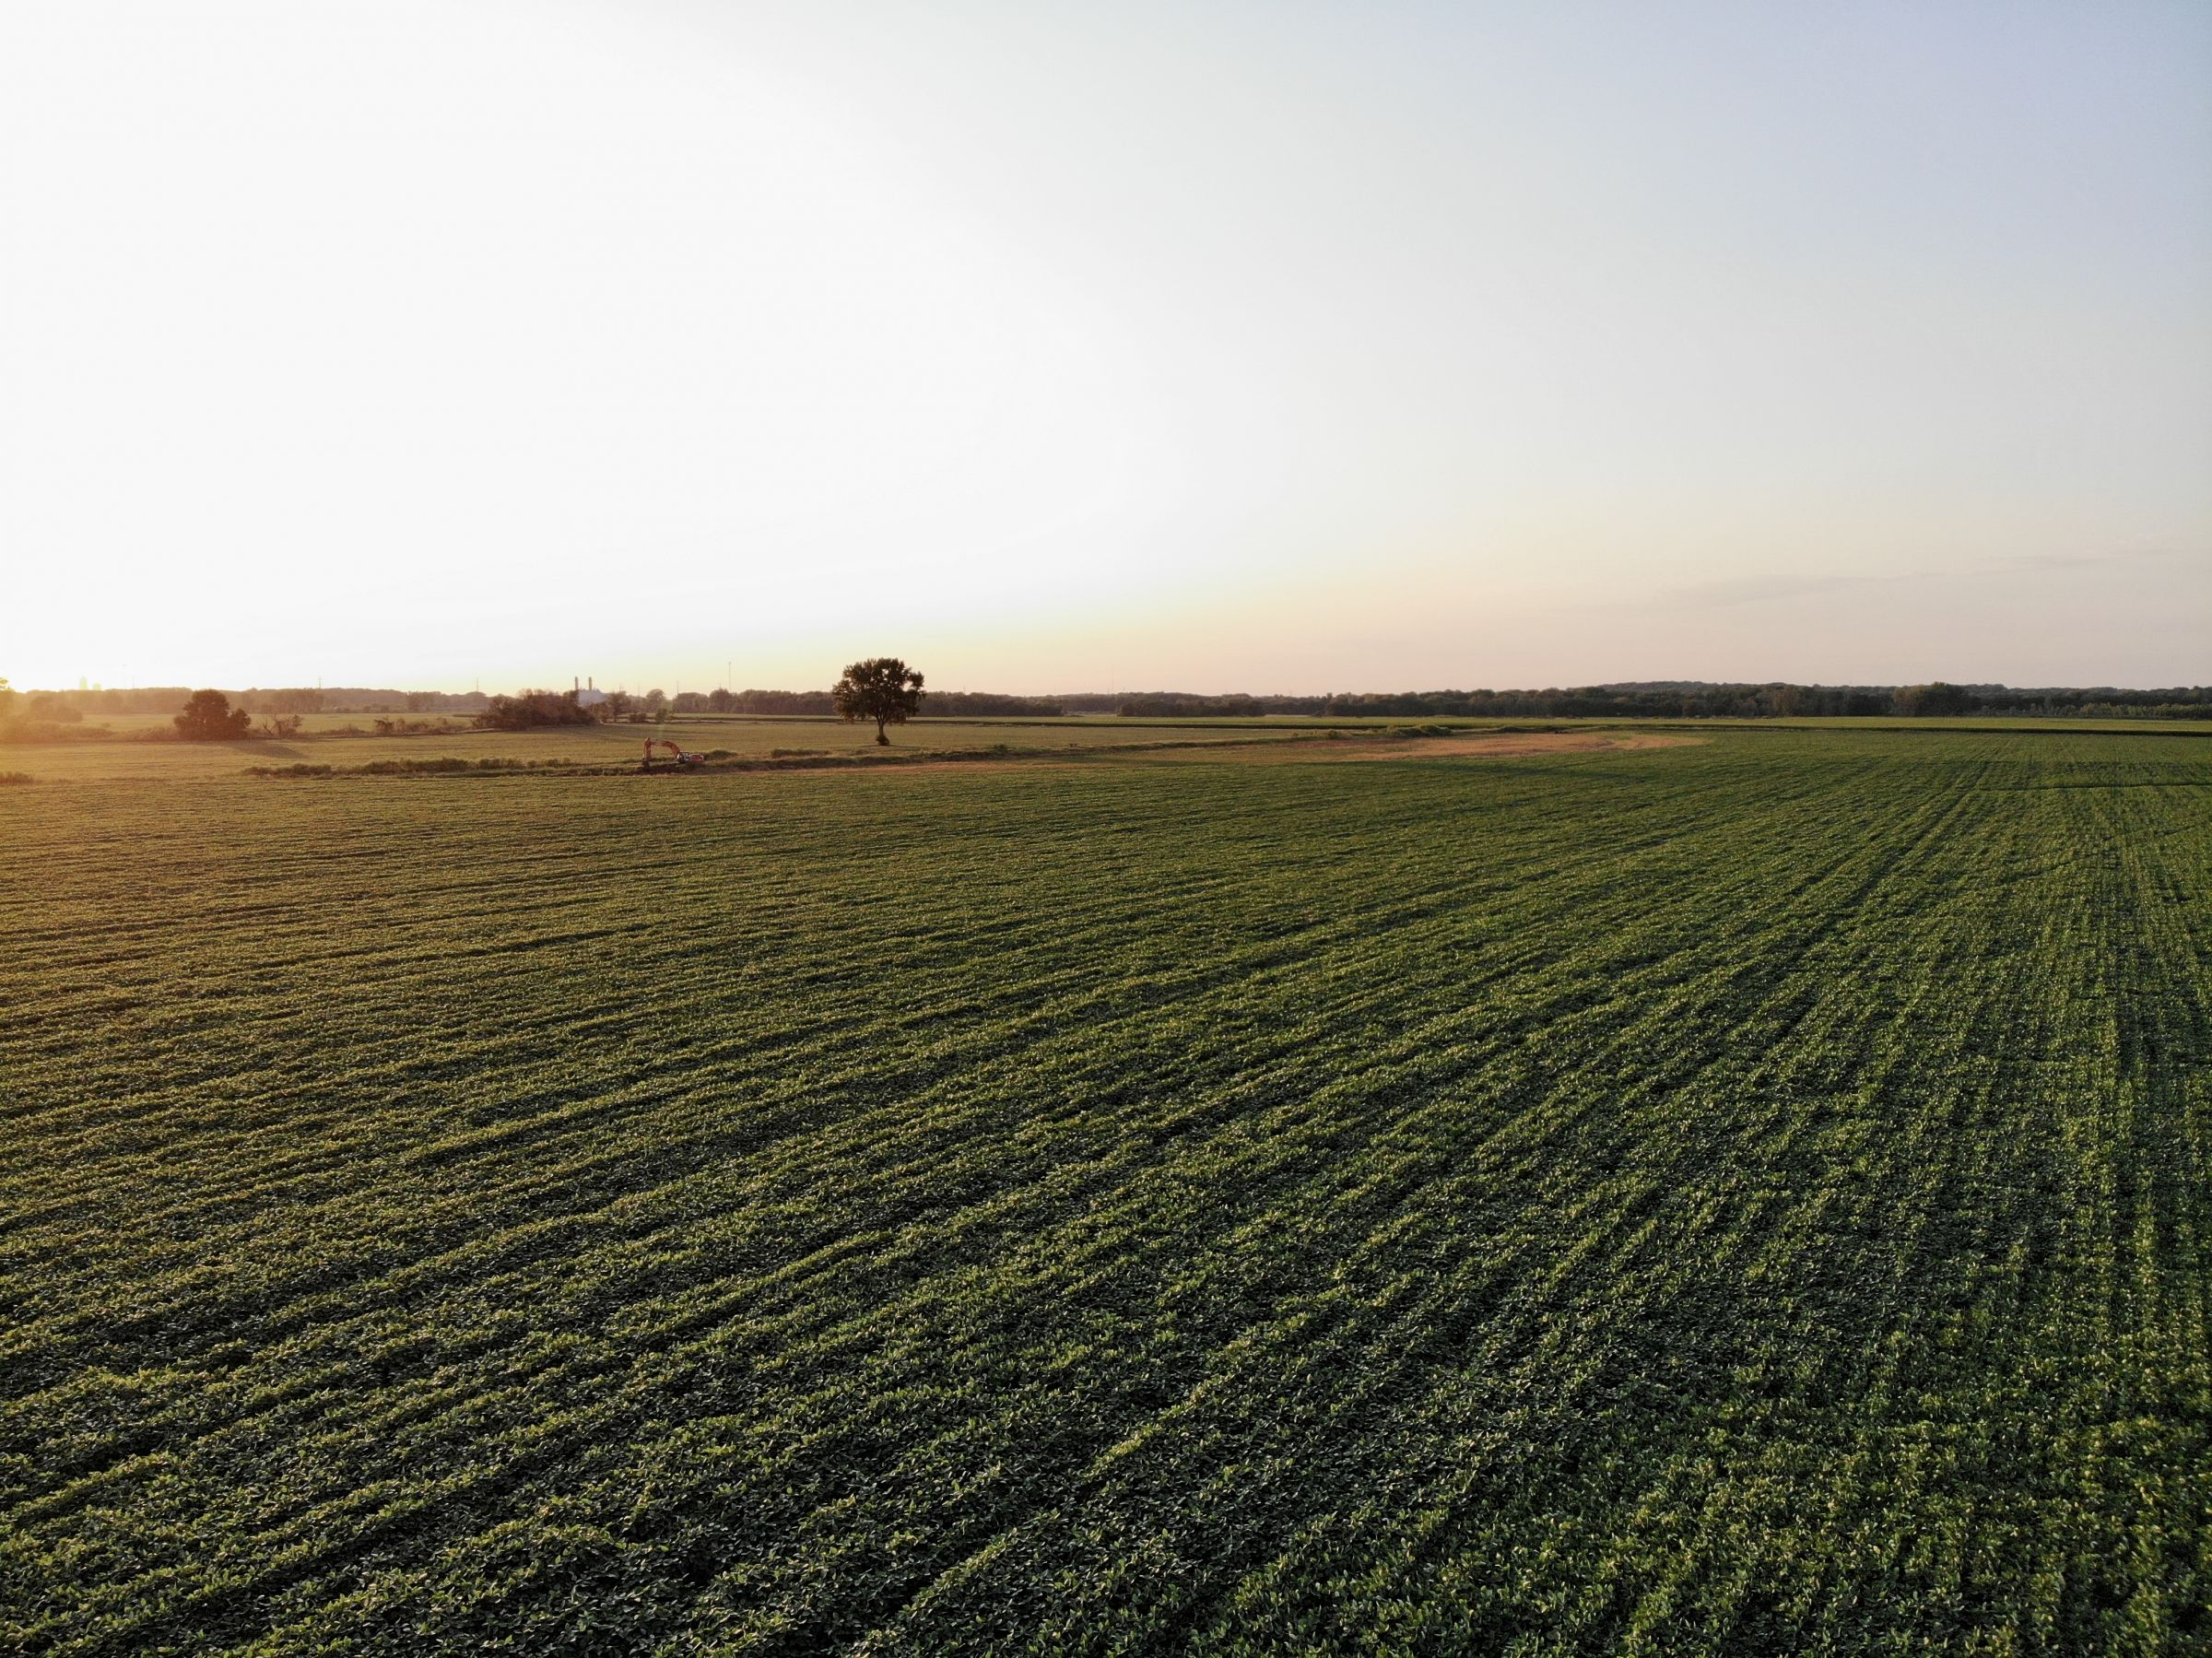 land-polk-county-iowa-202-acres-listing-number-15625-2-2021-07-09-140401.jpg